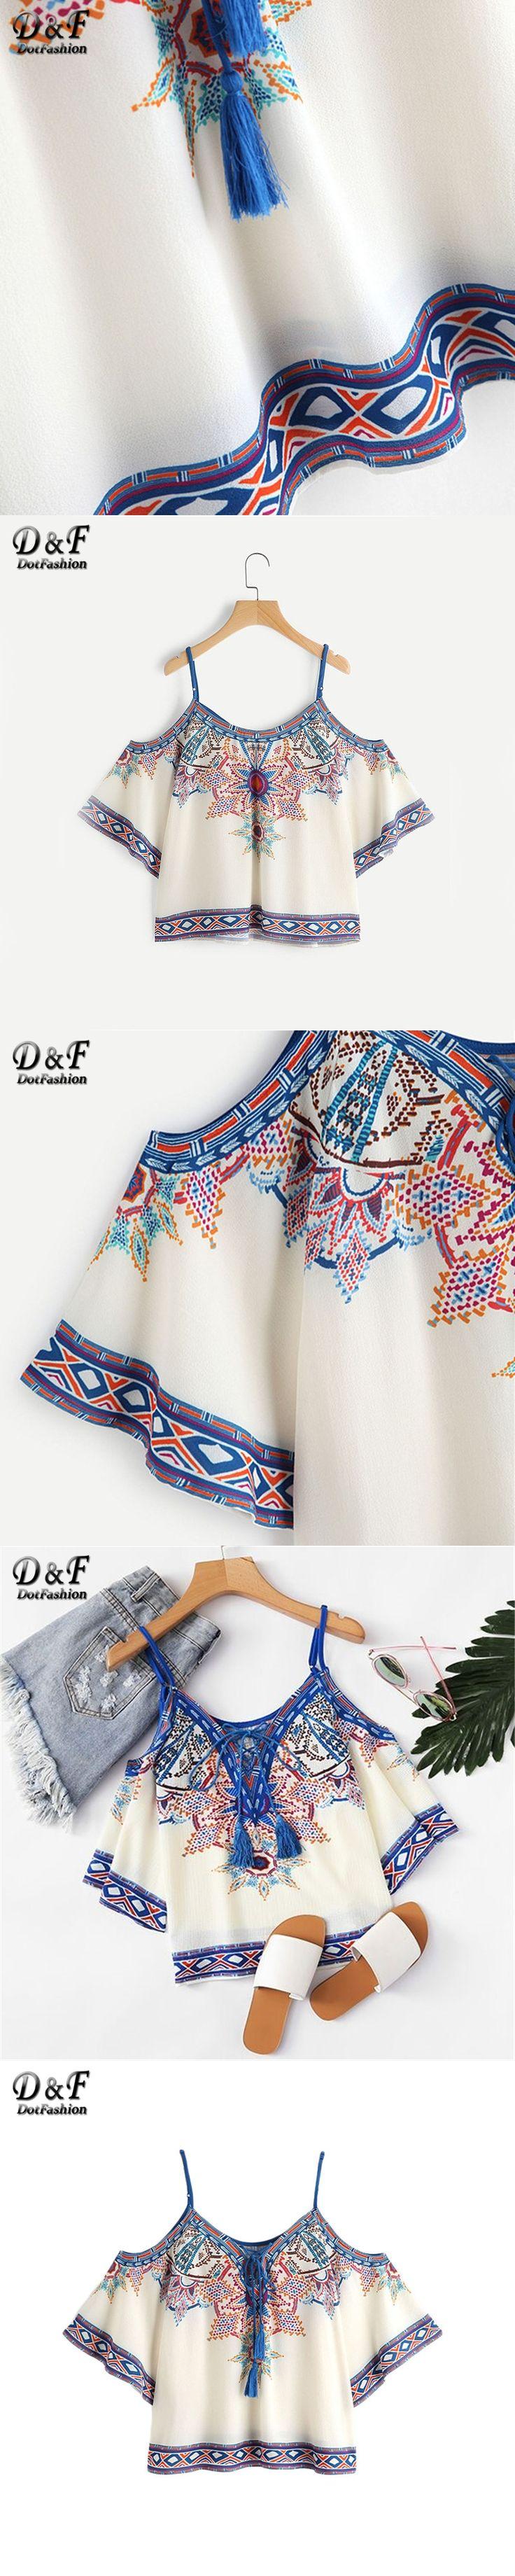 Dotfashion Aztec Print Boho Blouse 2017 Women Vintage Lace Up Cold Shoulder Summer Tops Fashion Sexy Tribal Short Sleeve Blouse